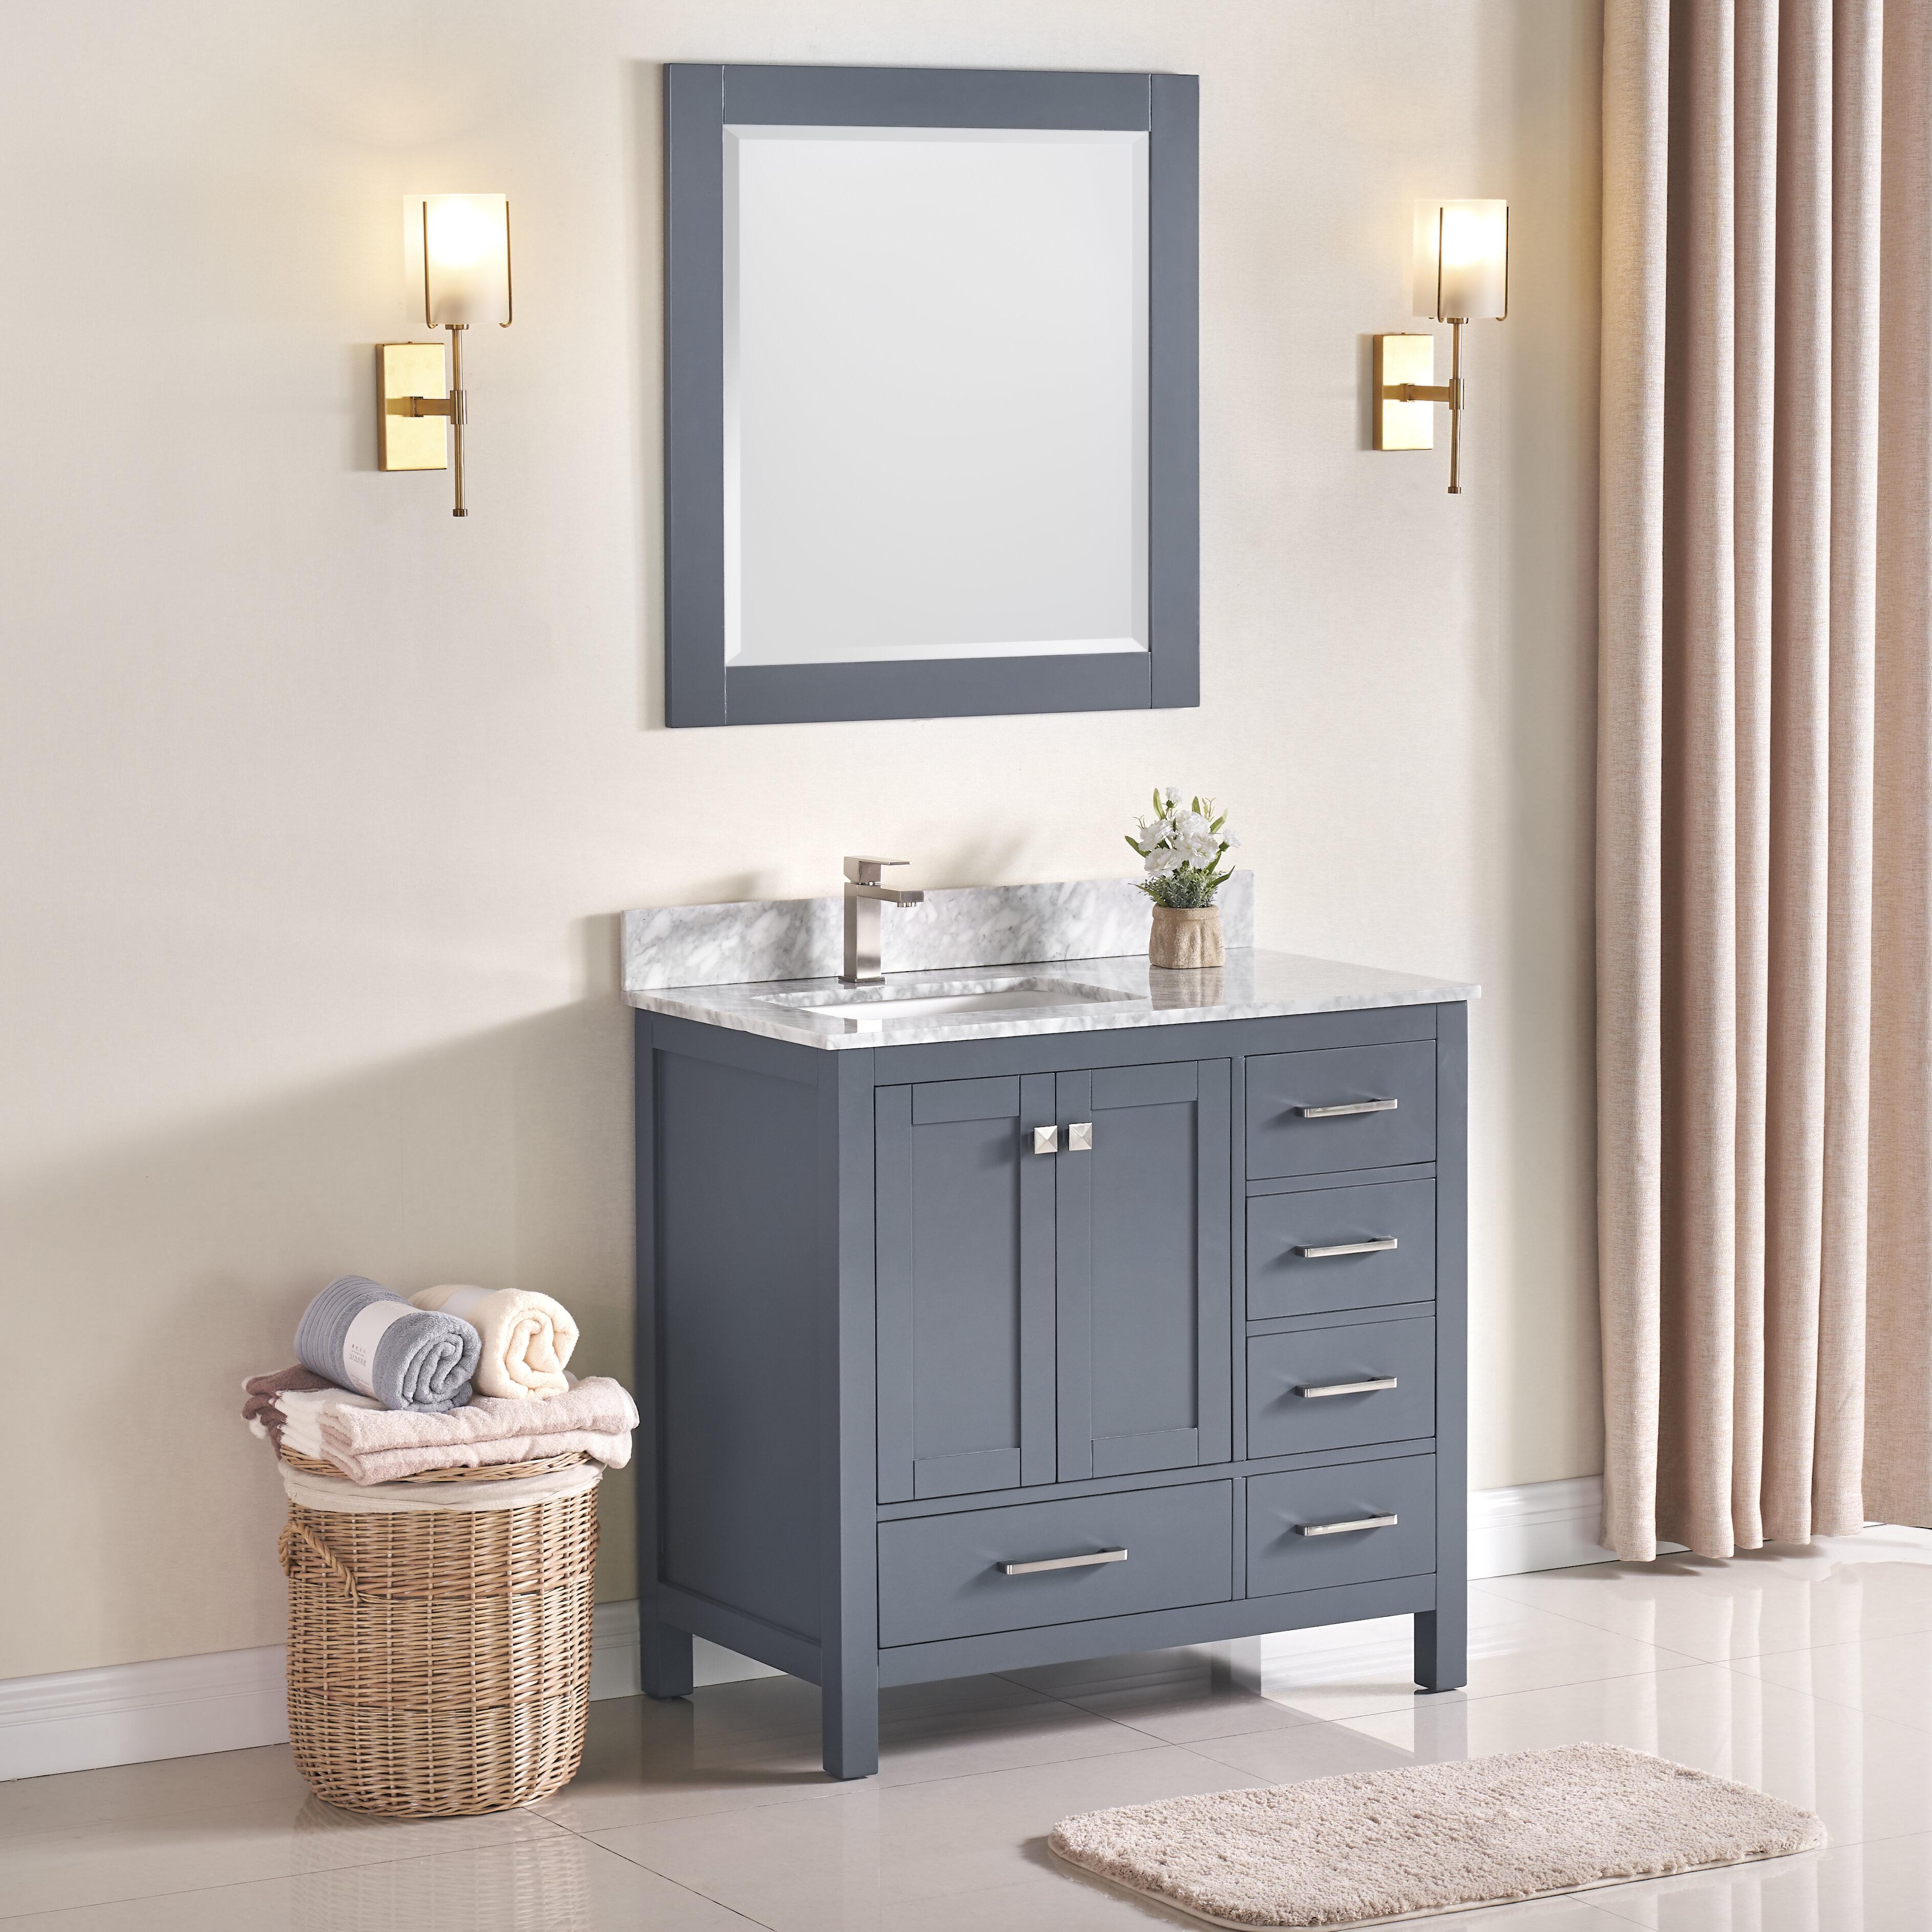 Charlton Home Exquisite Home 36 Single Bathroom Vanity Set With Mirror Wayfair